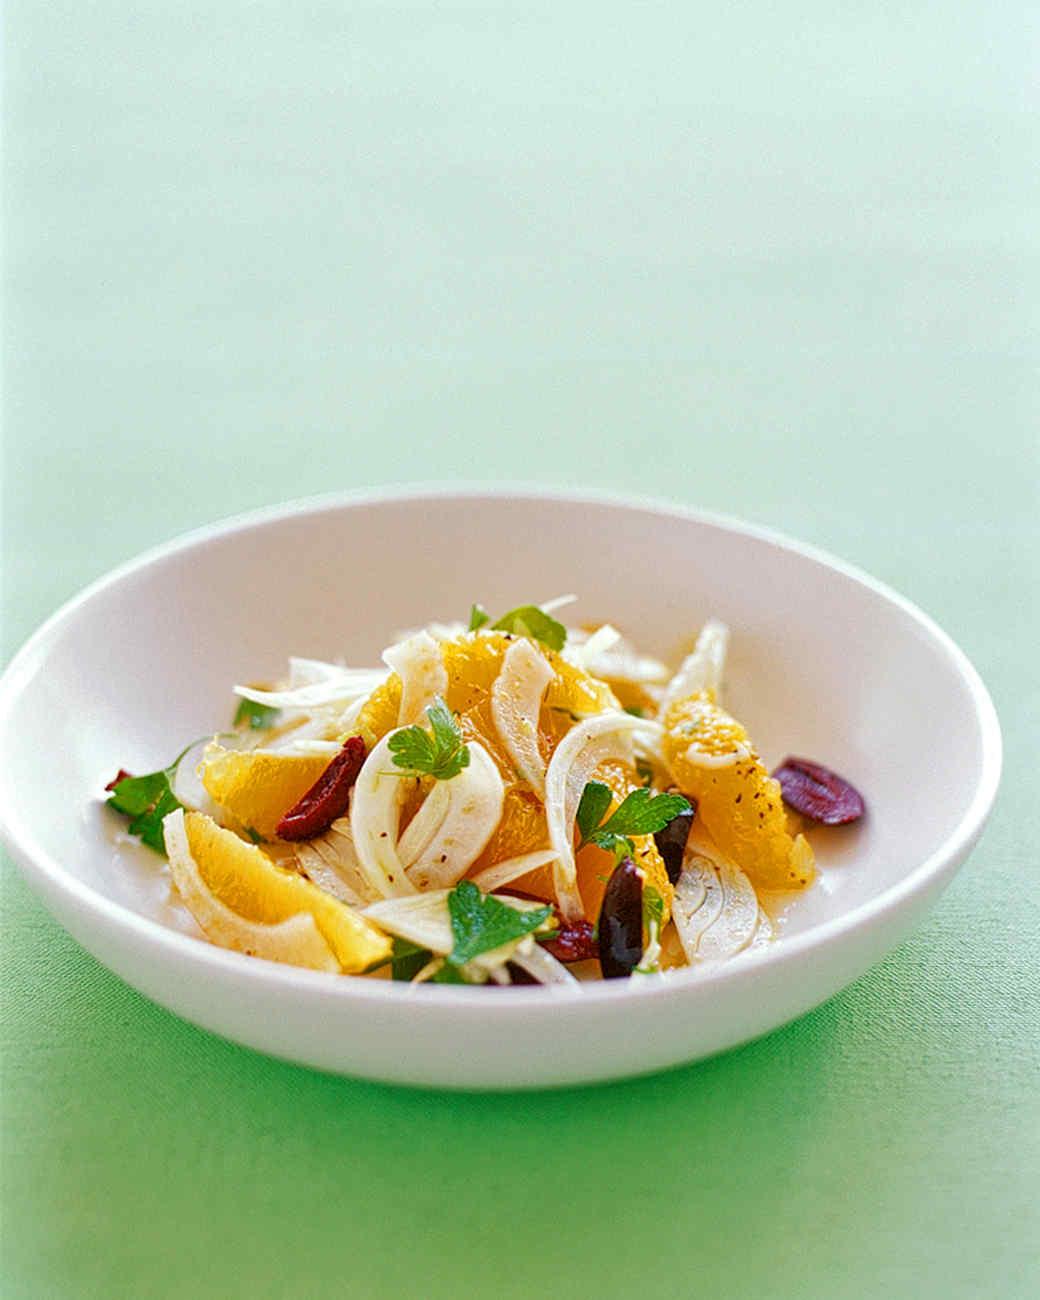 Fennel, Orange, and Parsley Salad